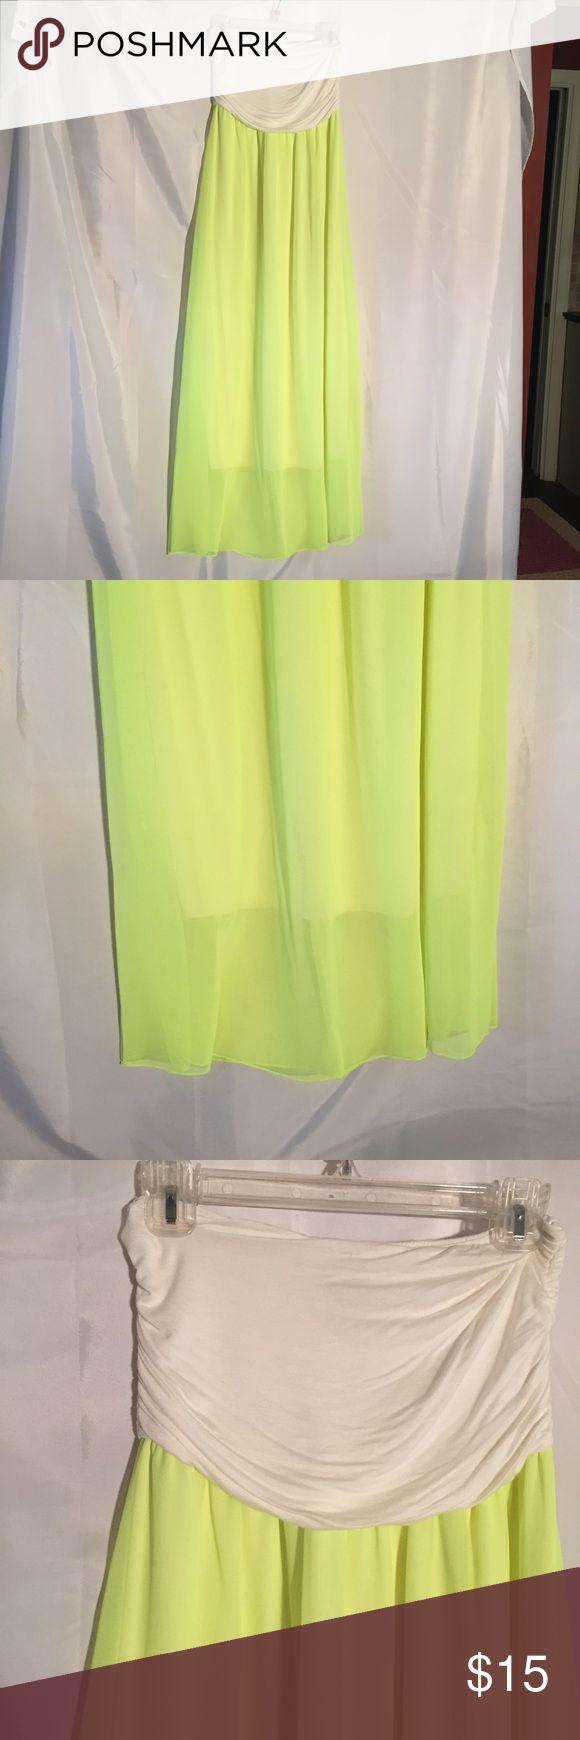 Nymphe yellow strapless maxi dress size M Nymphe yellow strapless maxi dress size M. 95% rayon 5% spandex Nymphe Dresses Maxi